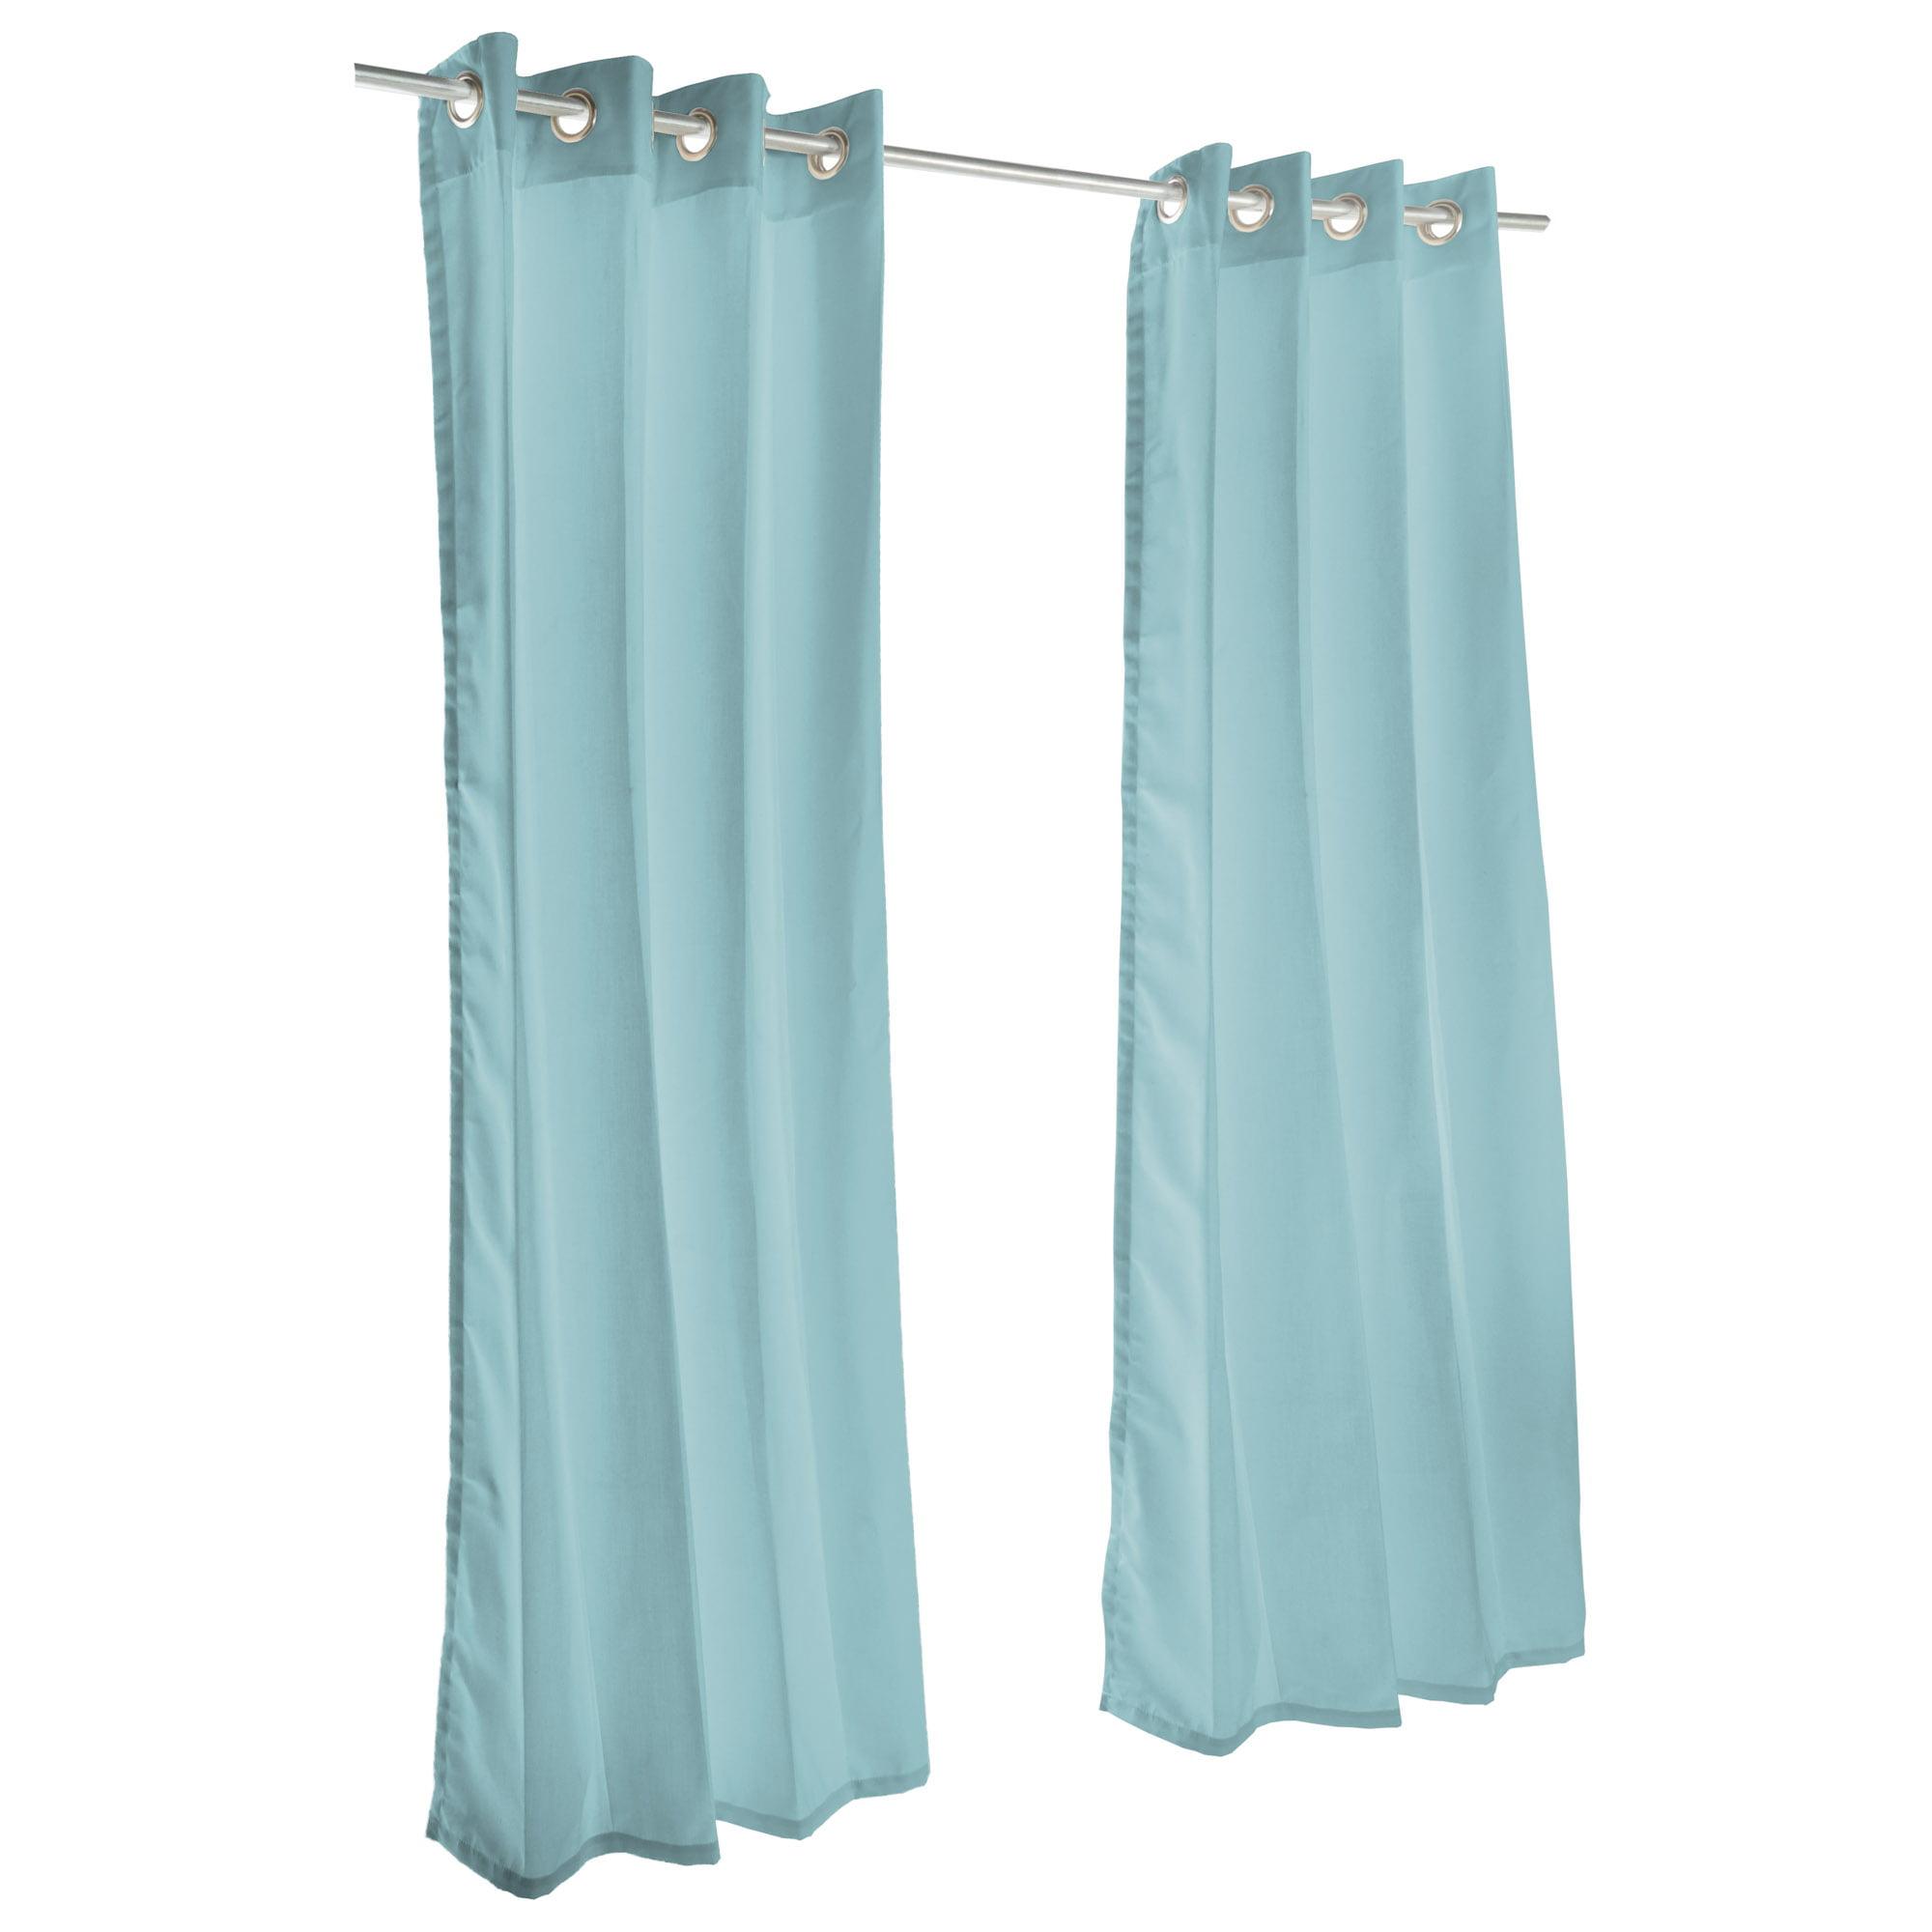 Pawleys Island Sunbrella Outdoor Gazebo Grommeted Solid Curtain Panel Spectrum Mist